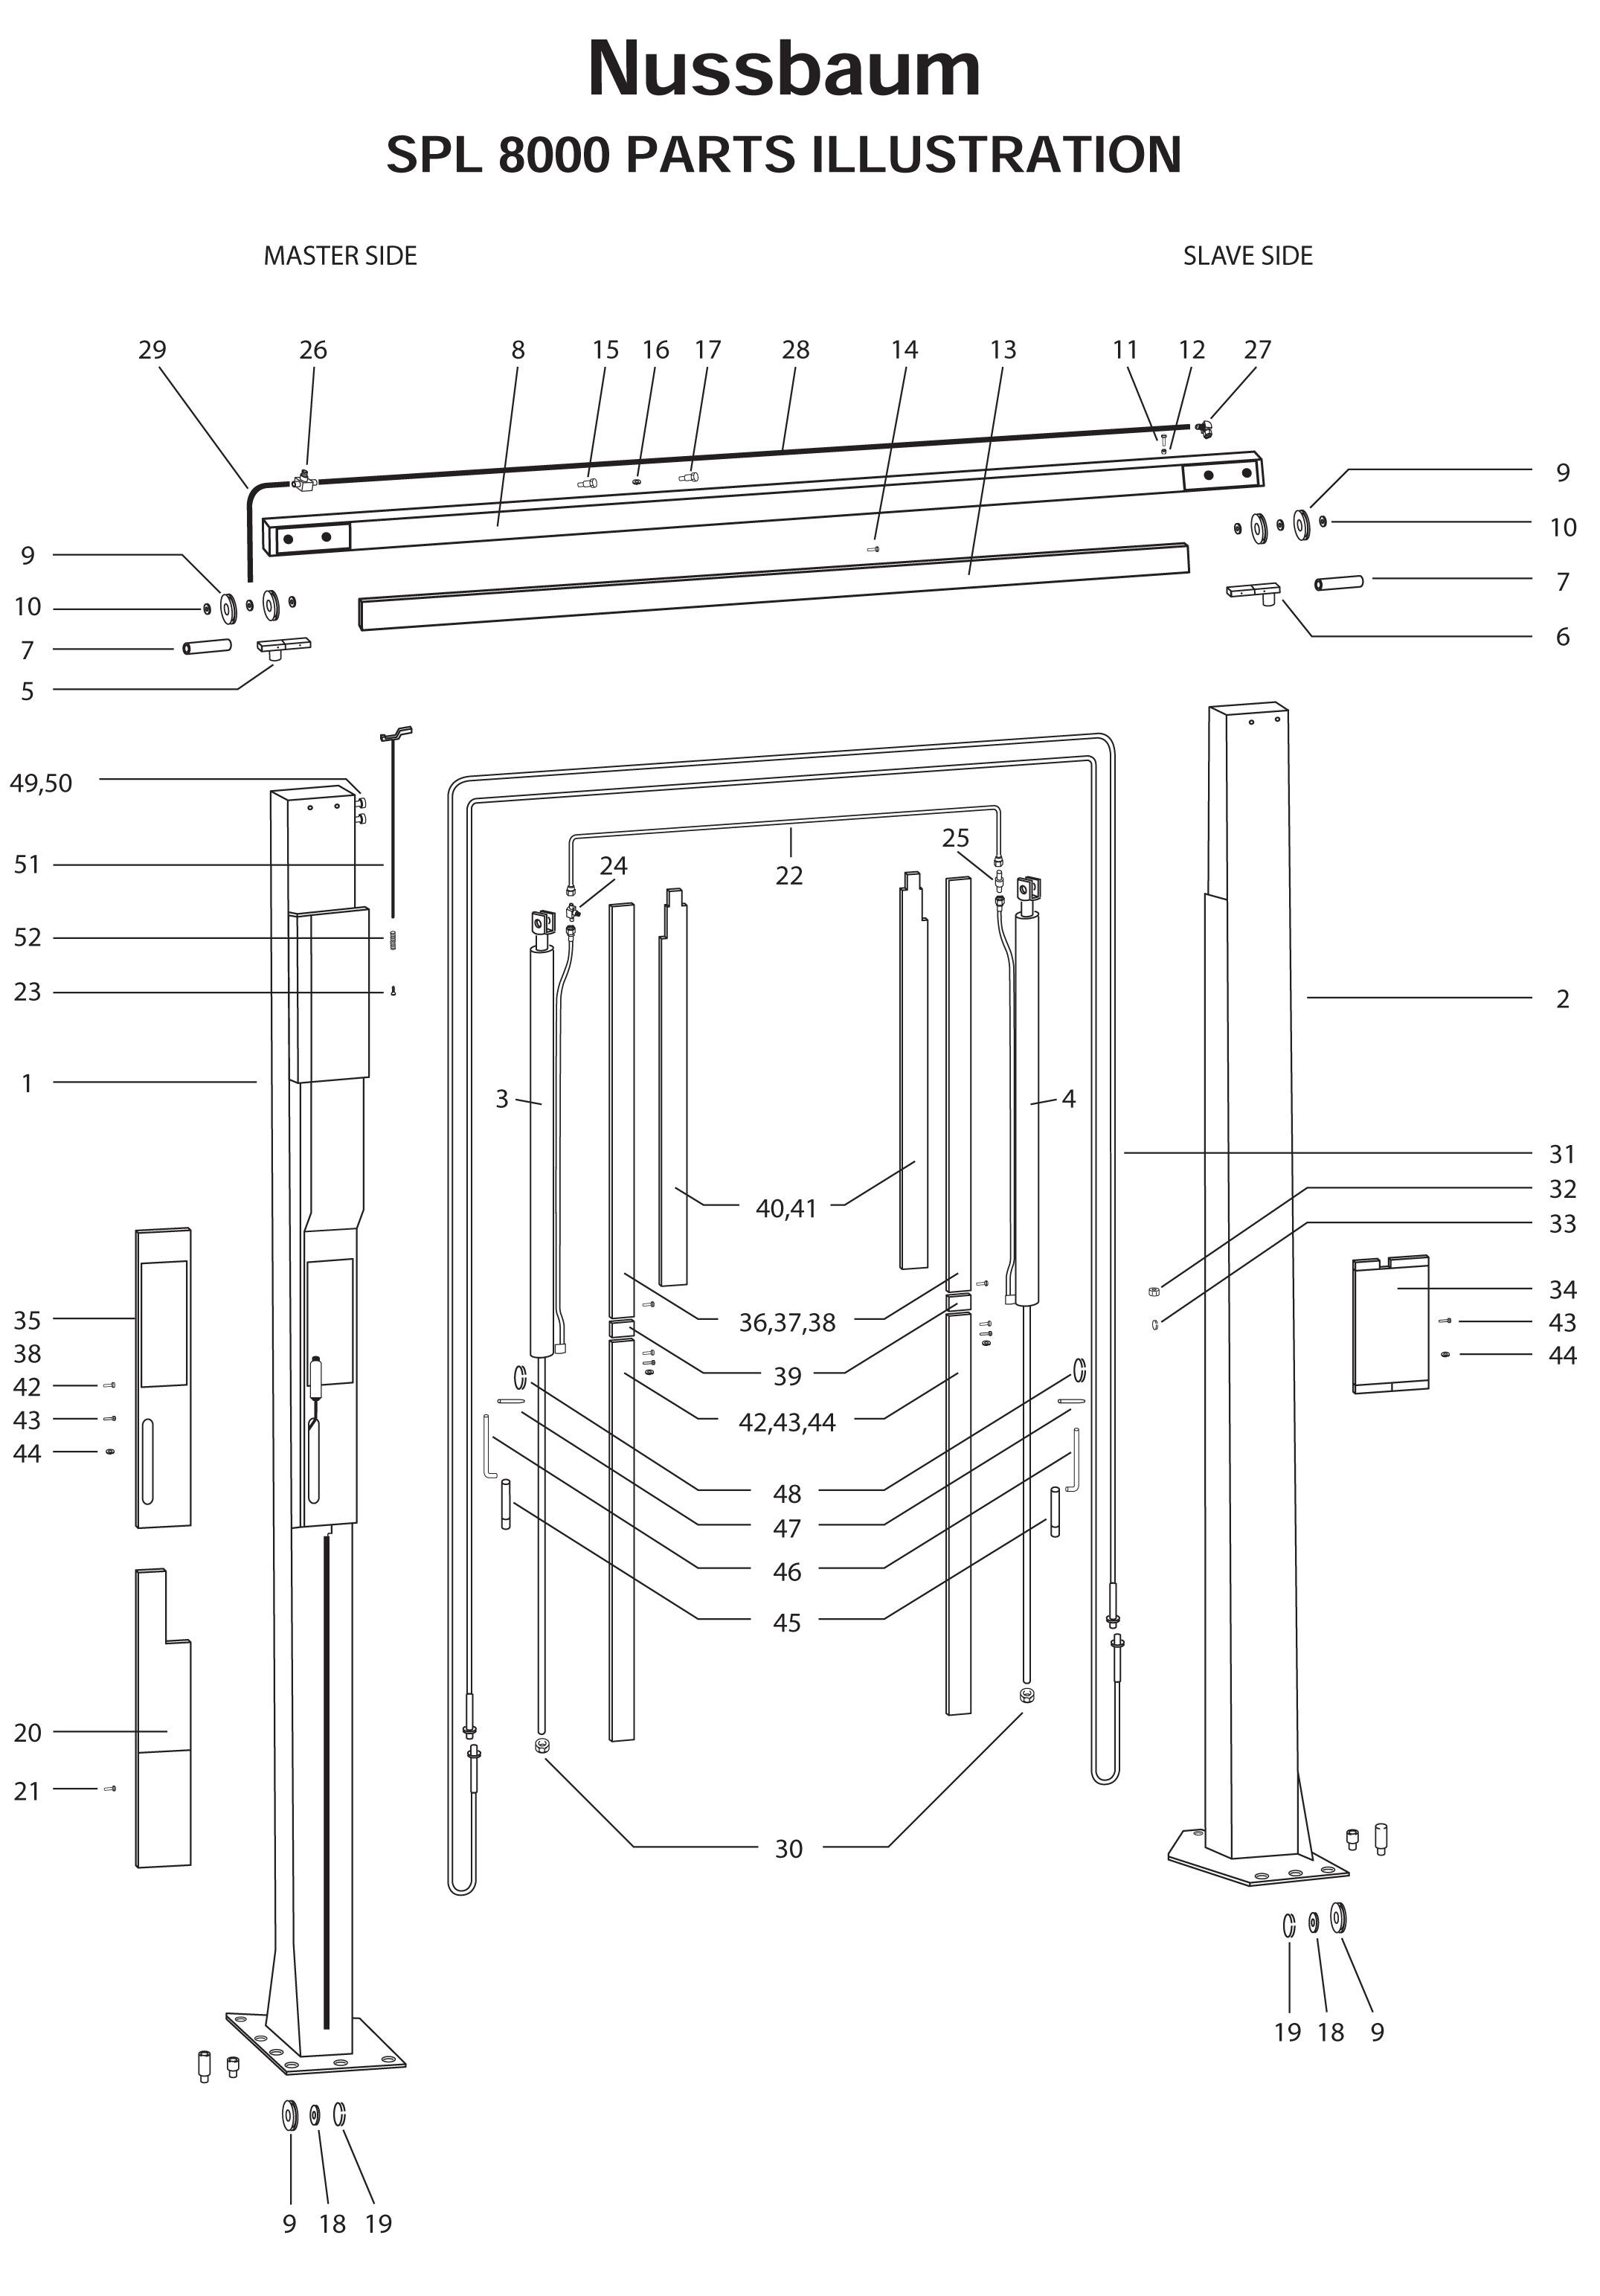 nussbaum lift manual user guide manual that easy to read u2022 rh wowomg co nussbaum jumbo lift 2 manual nussbaum jumbo lift 2 manual